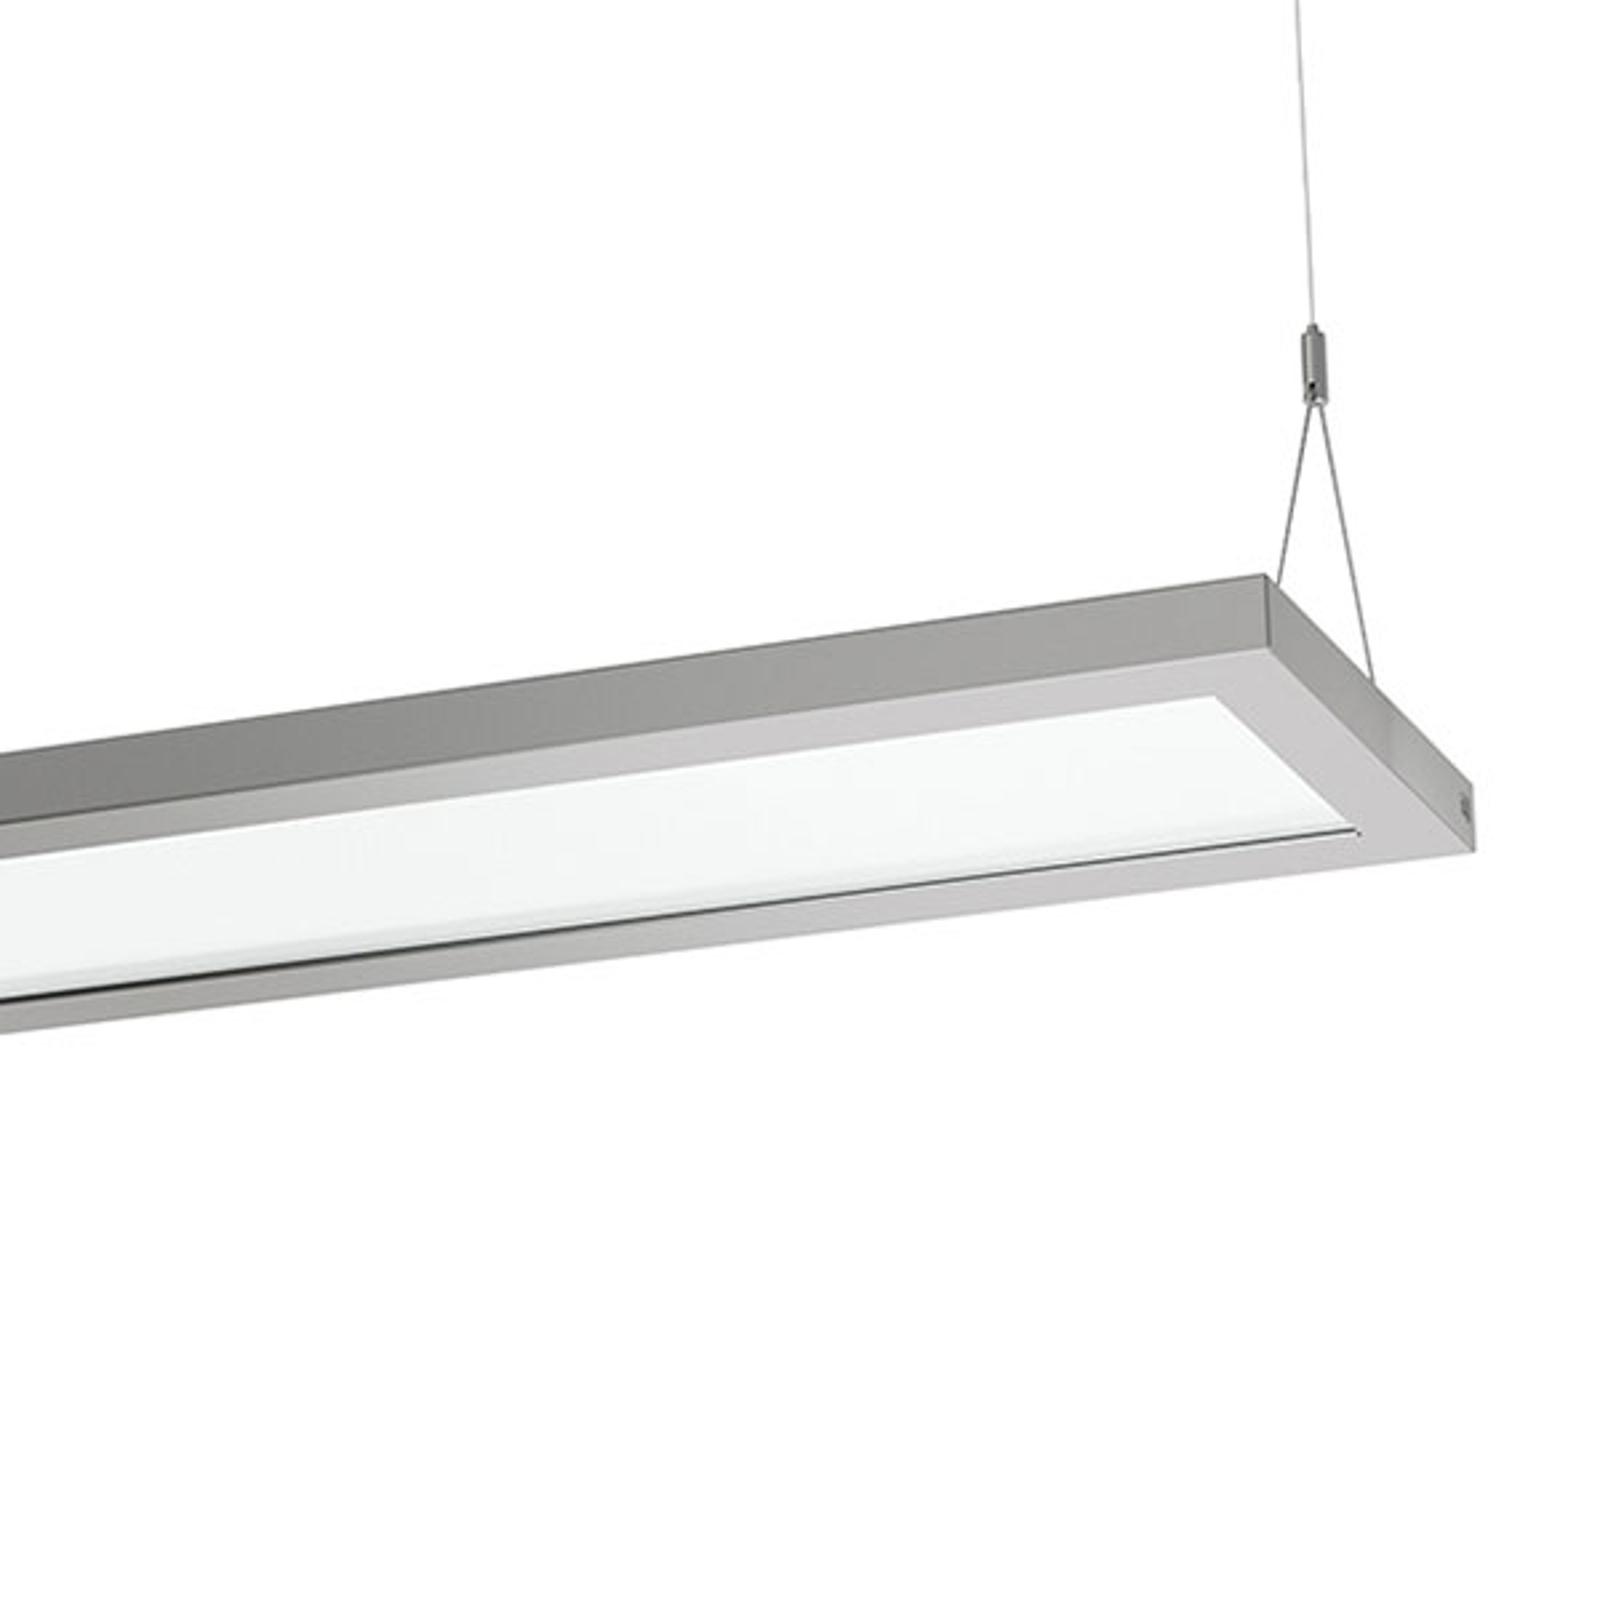 Lampa wisząca SL629PL 124 szara 3000K